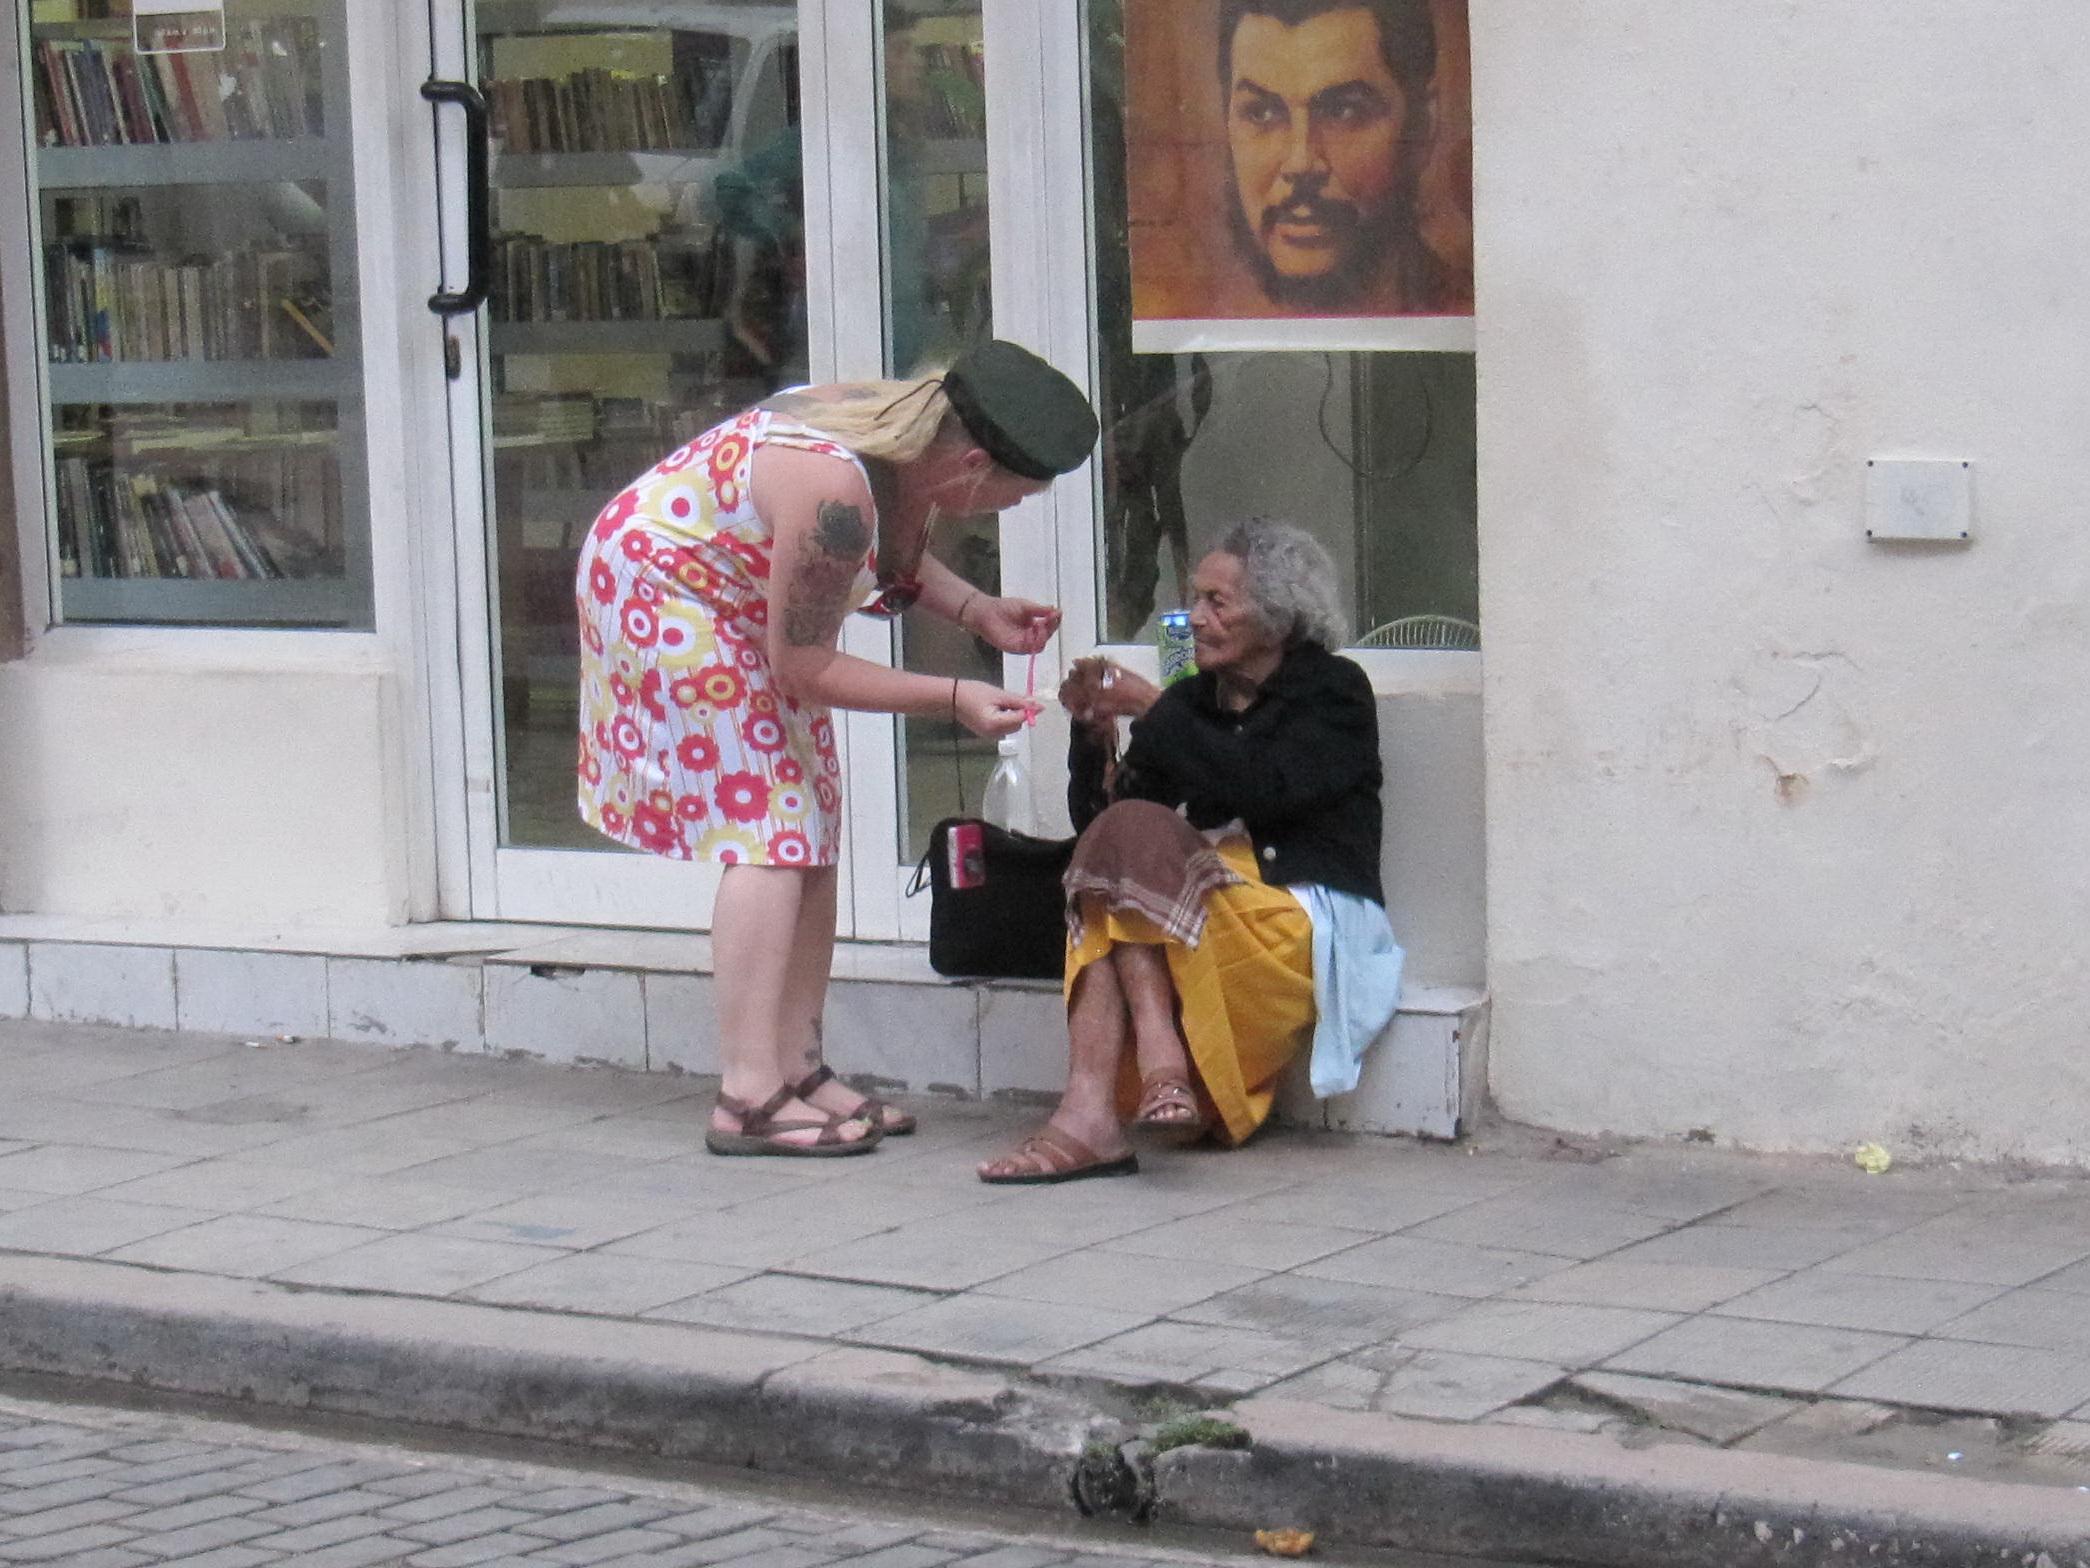 Onsdag gadesælger